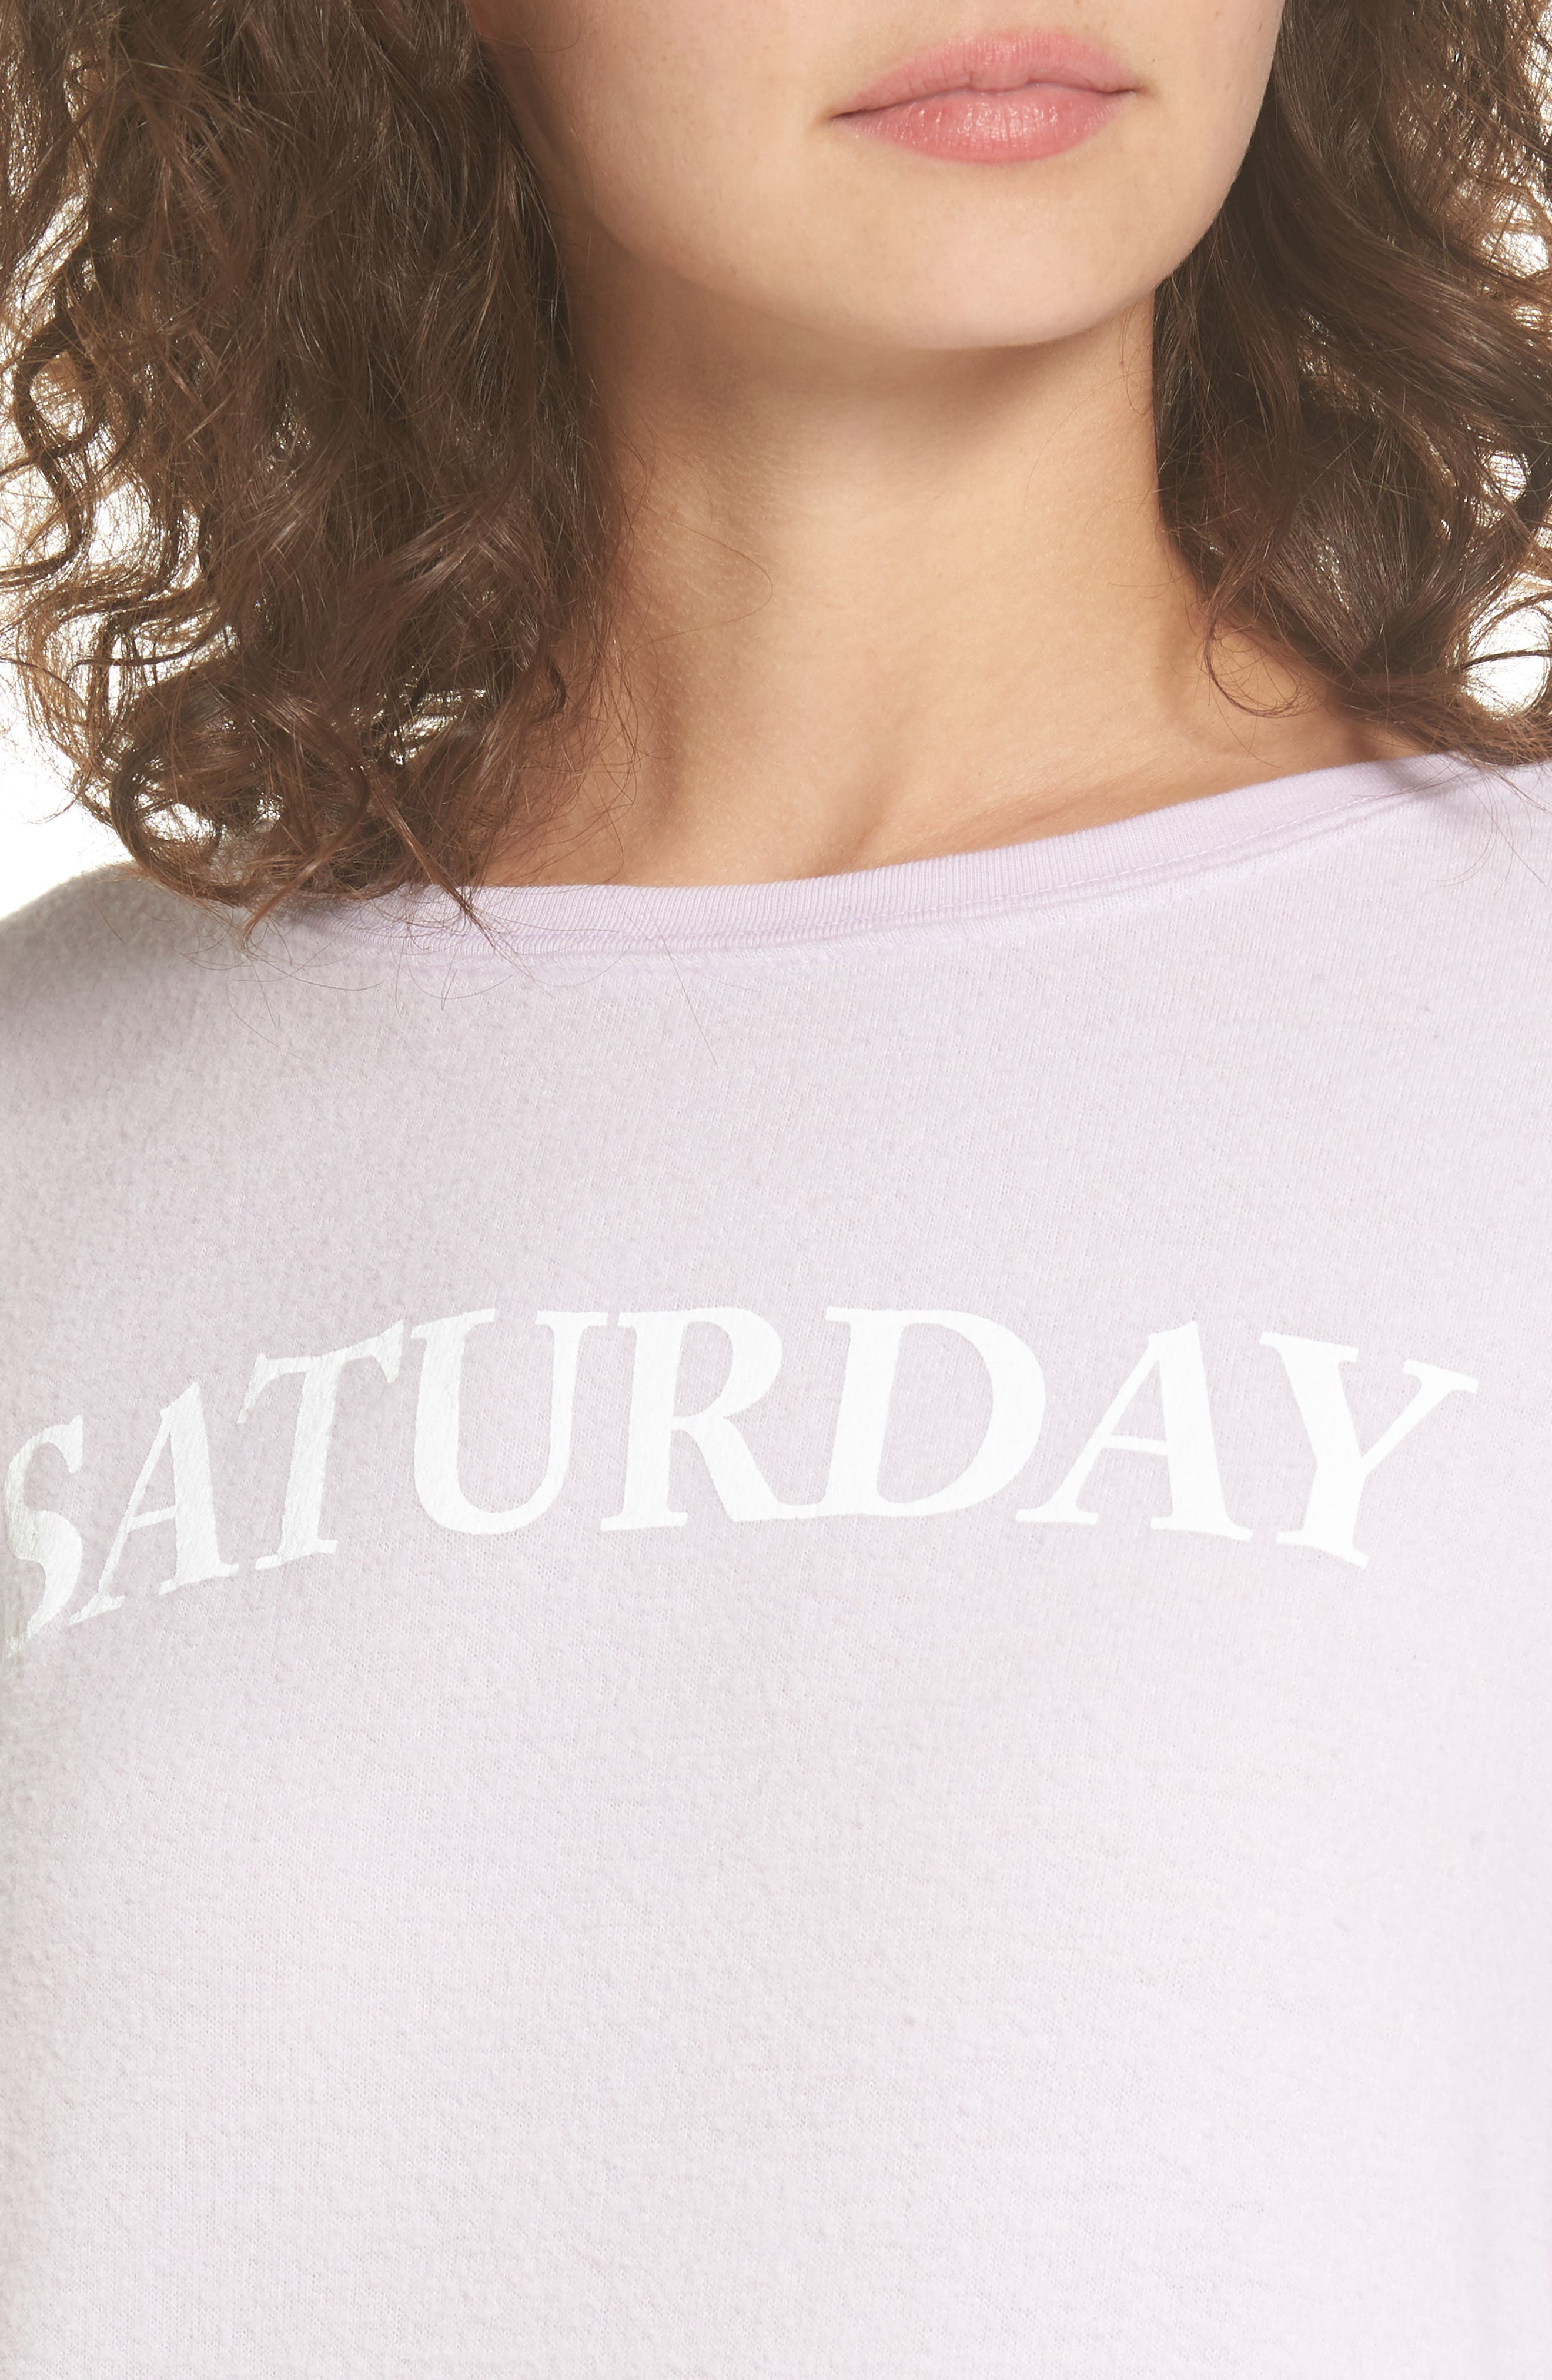 Saturday Sweatshirt,                             Alternate thumbnail 4, color,                             Purple